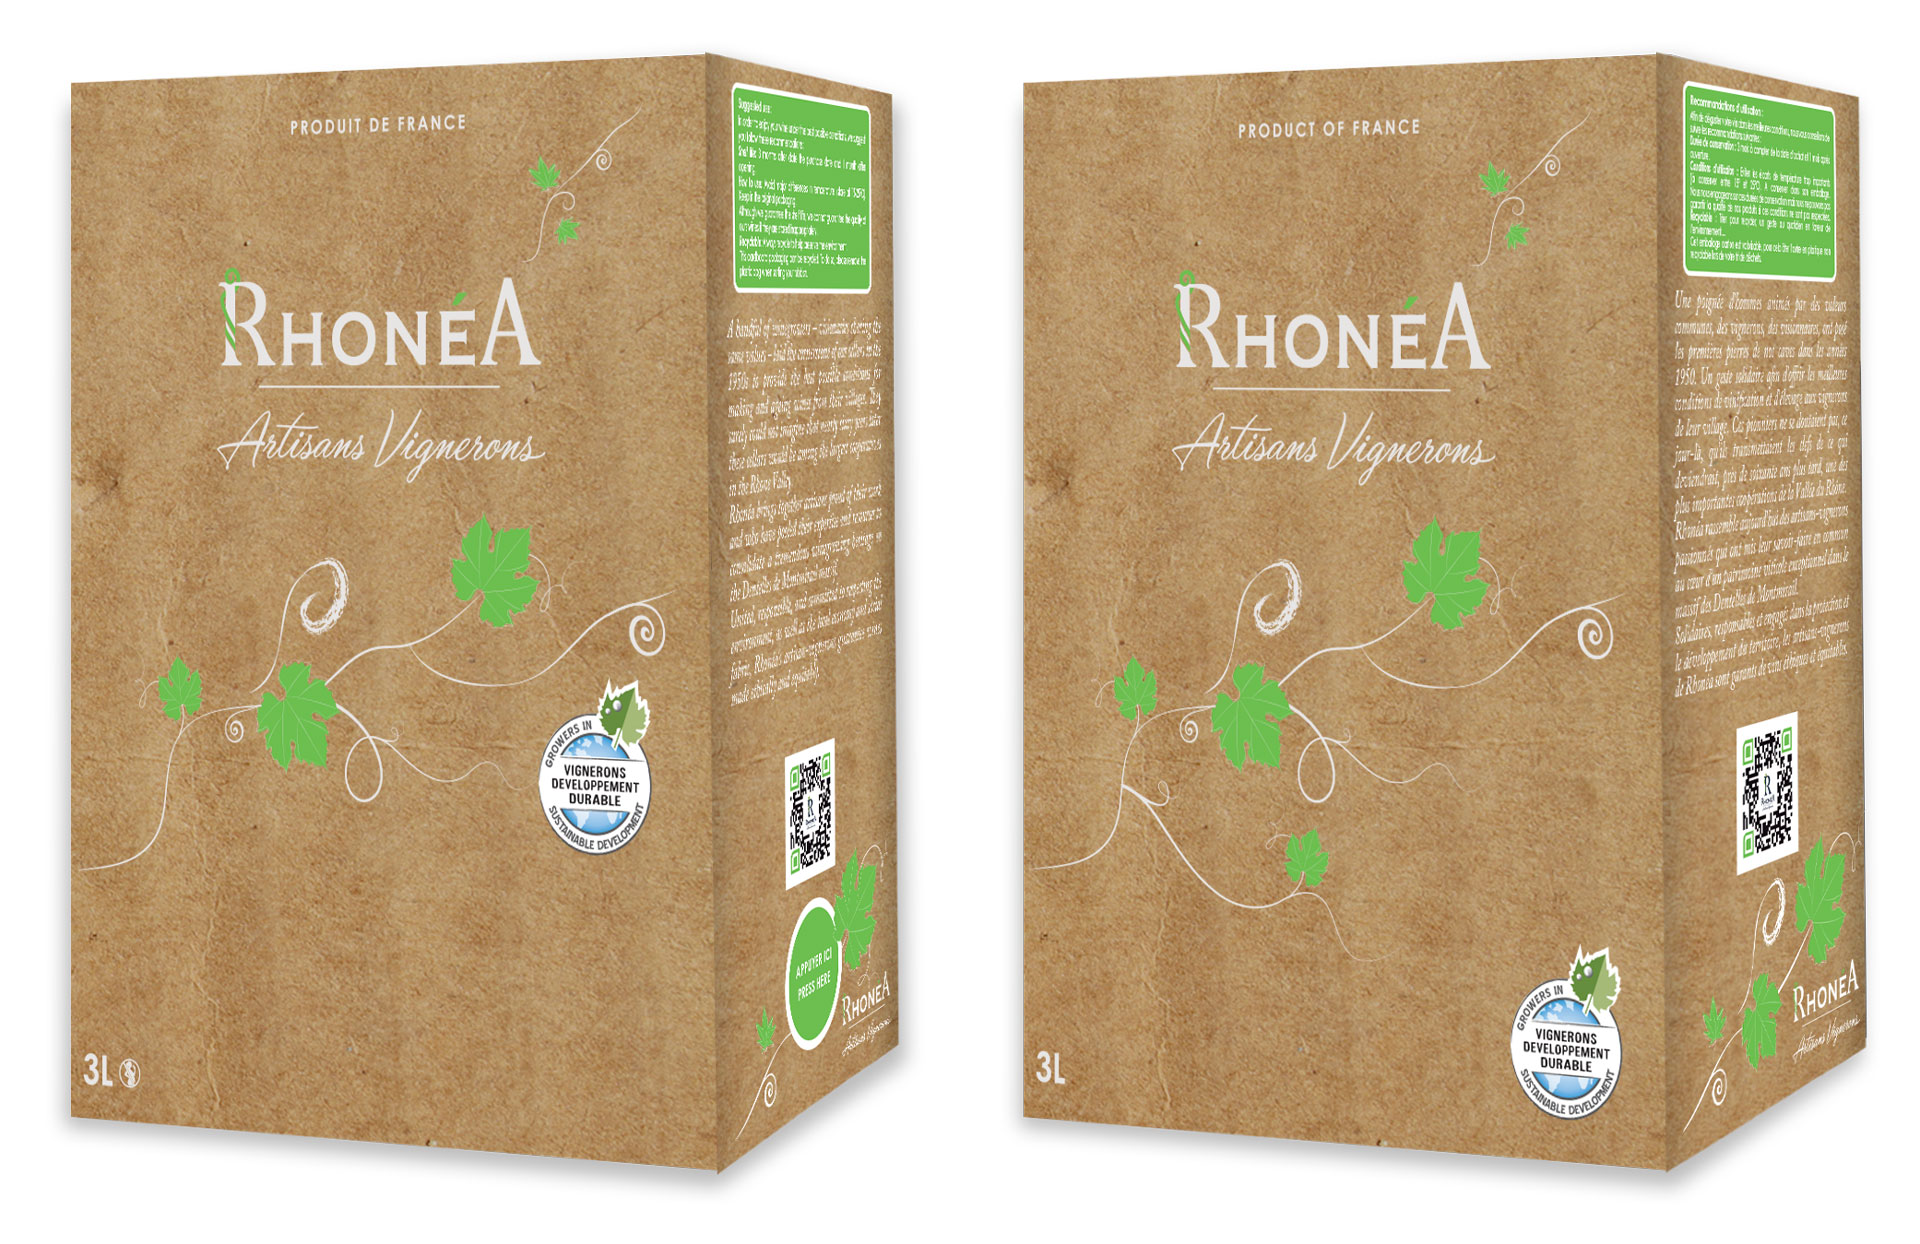 RHONEA